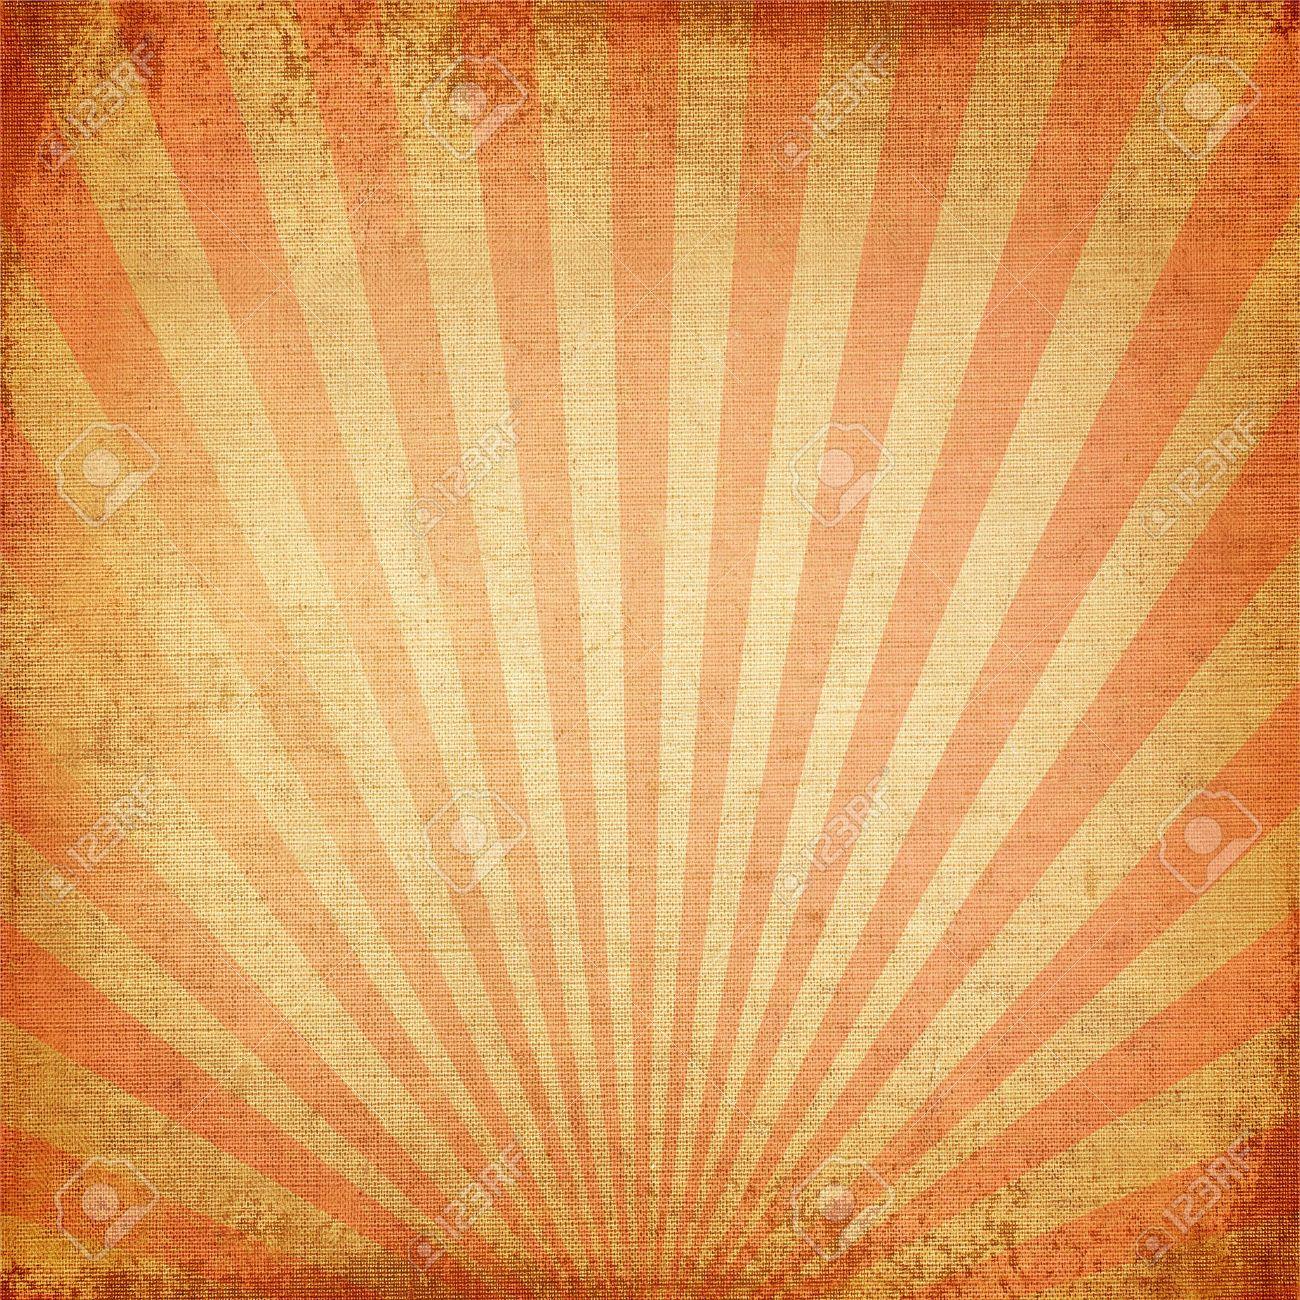 Vintage Background Red Rising Sun Or Sun Ray Sun Burst Retro Paper Be Crumpled Orange Background Red Rising Watercolour Texture Background